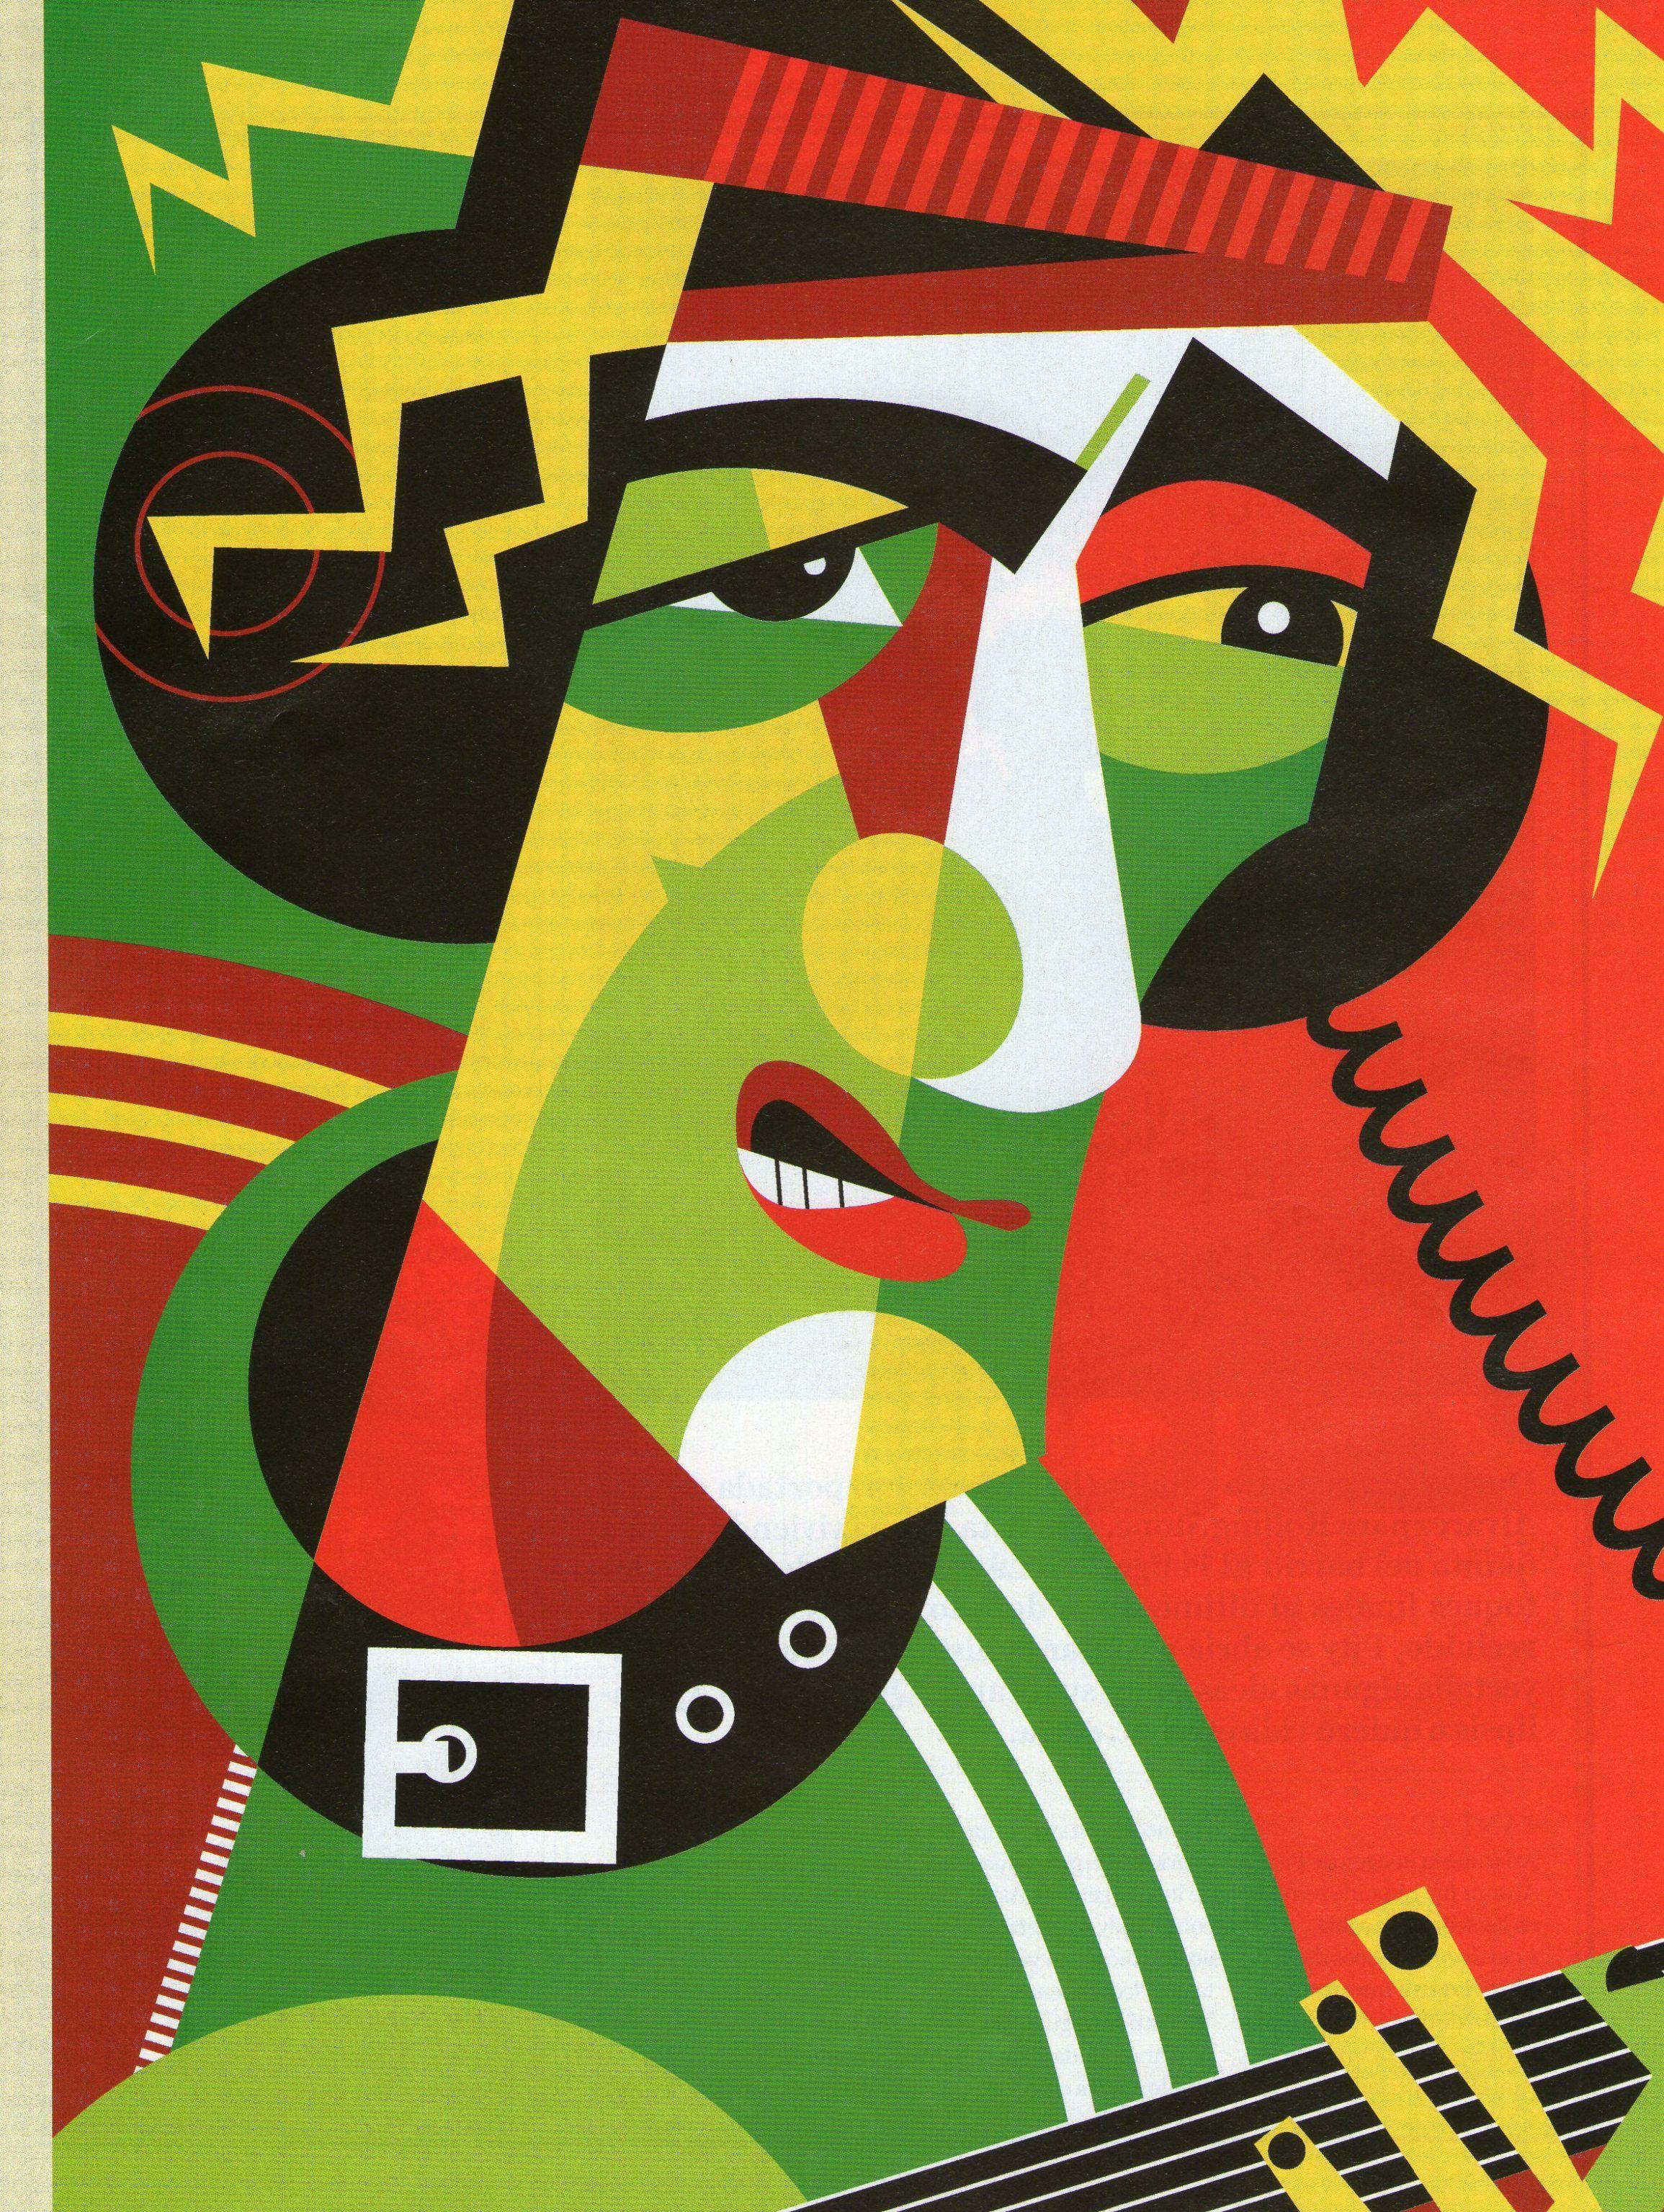 pablo lobato - Buscar con Google   Rock art   Pinterest   Buscar con ...